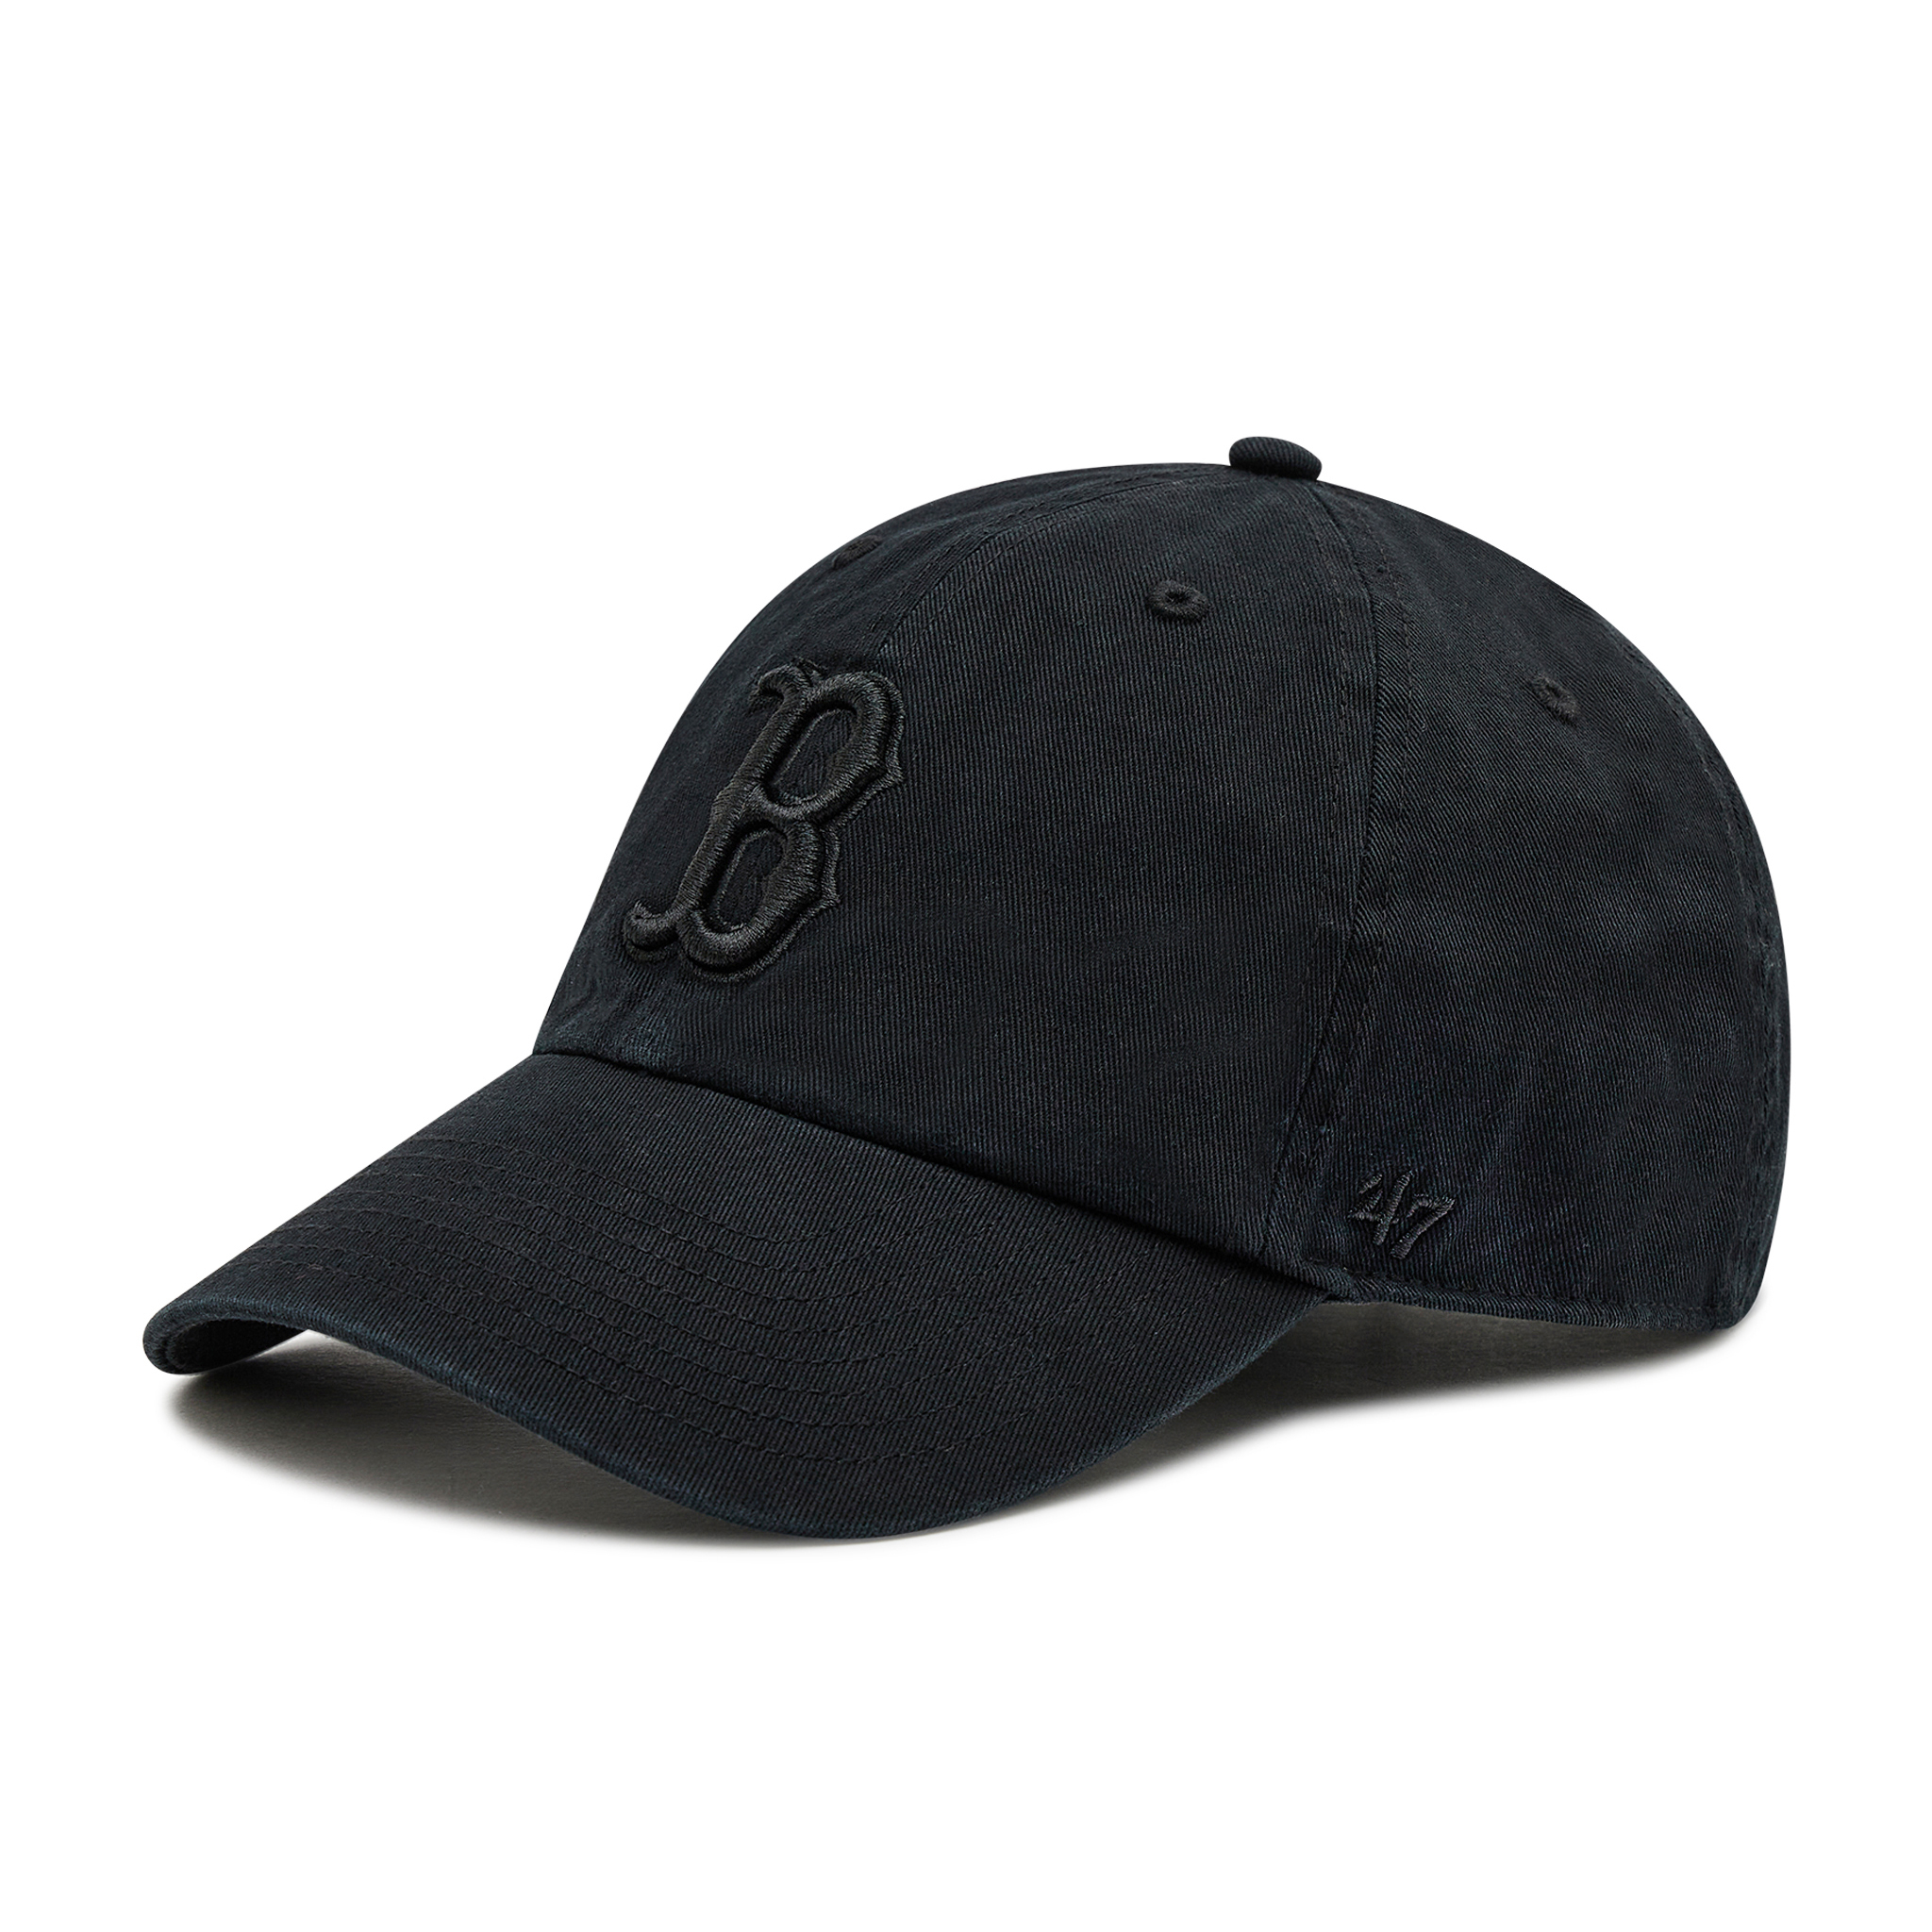 Image of Cap 47 BRAND - Boston Red Sox B-RGW02GWSNL-BKG Black